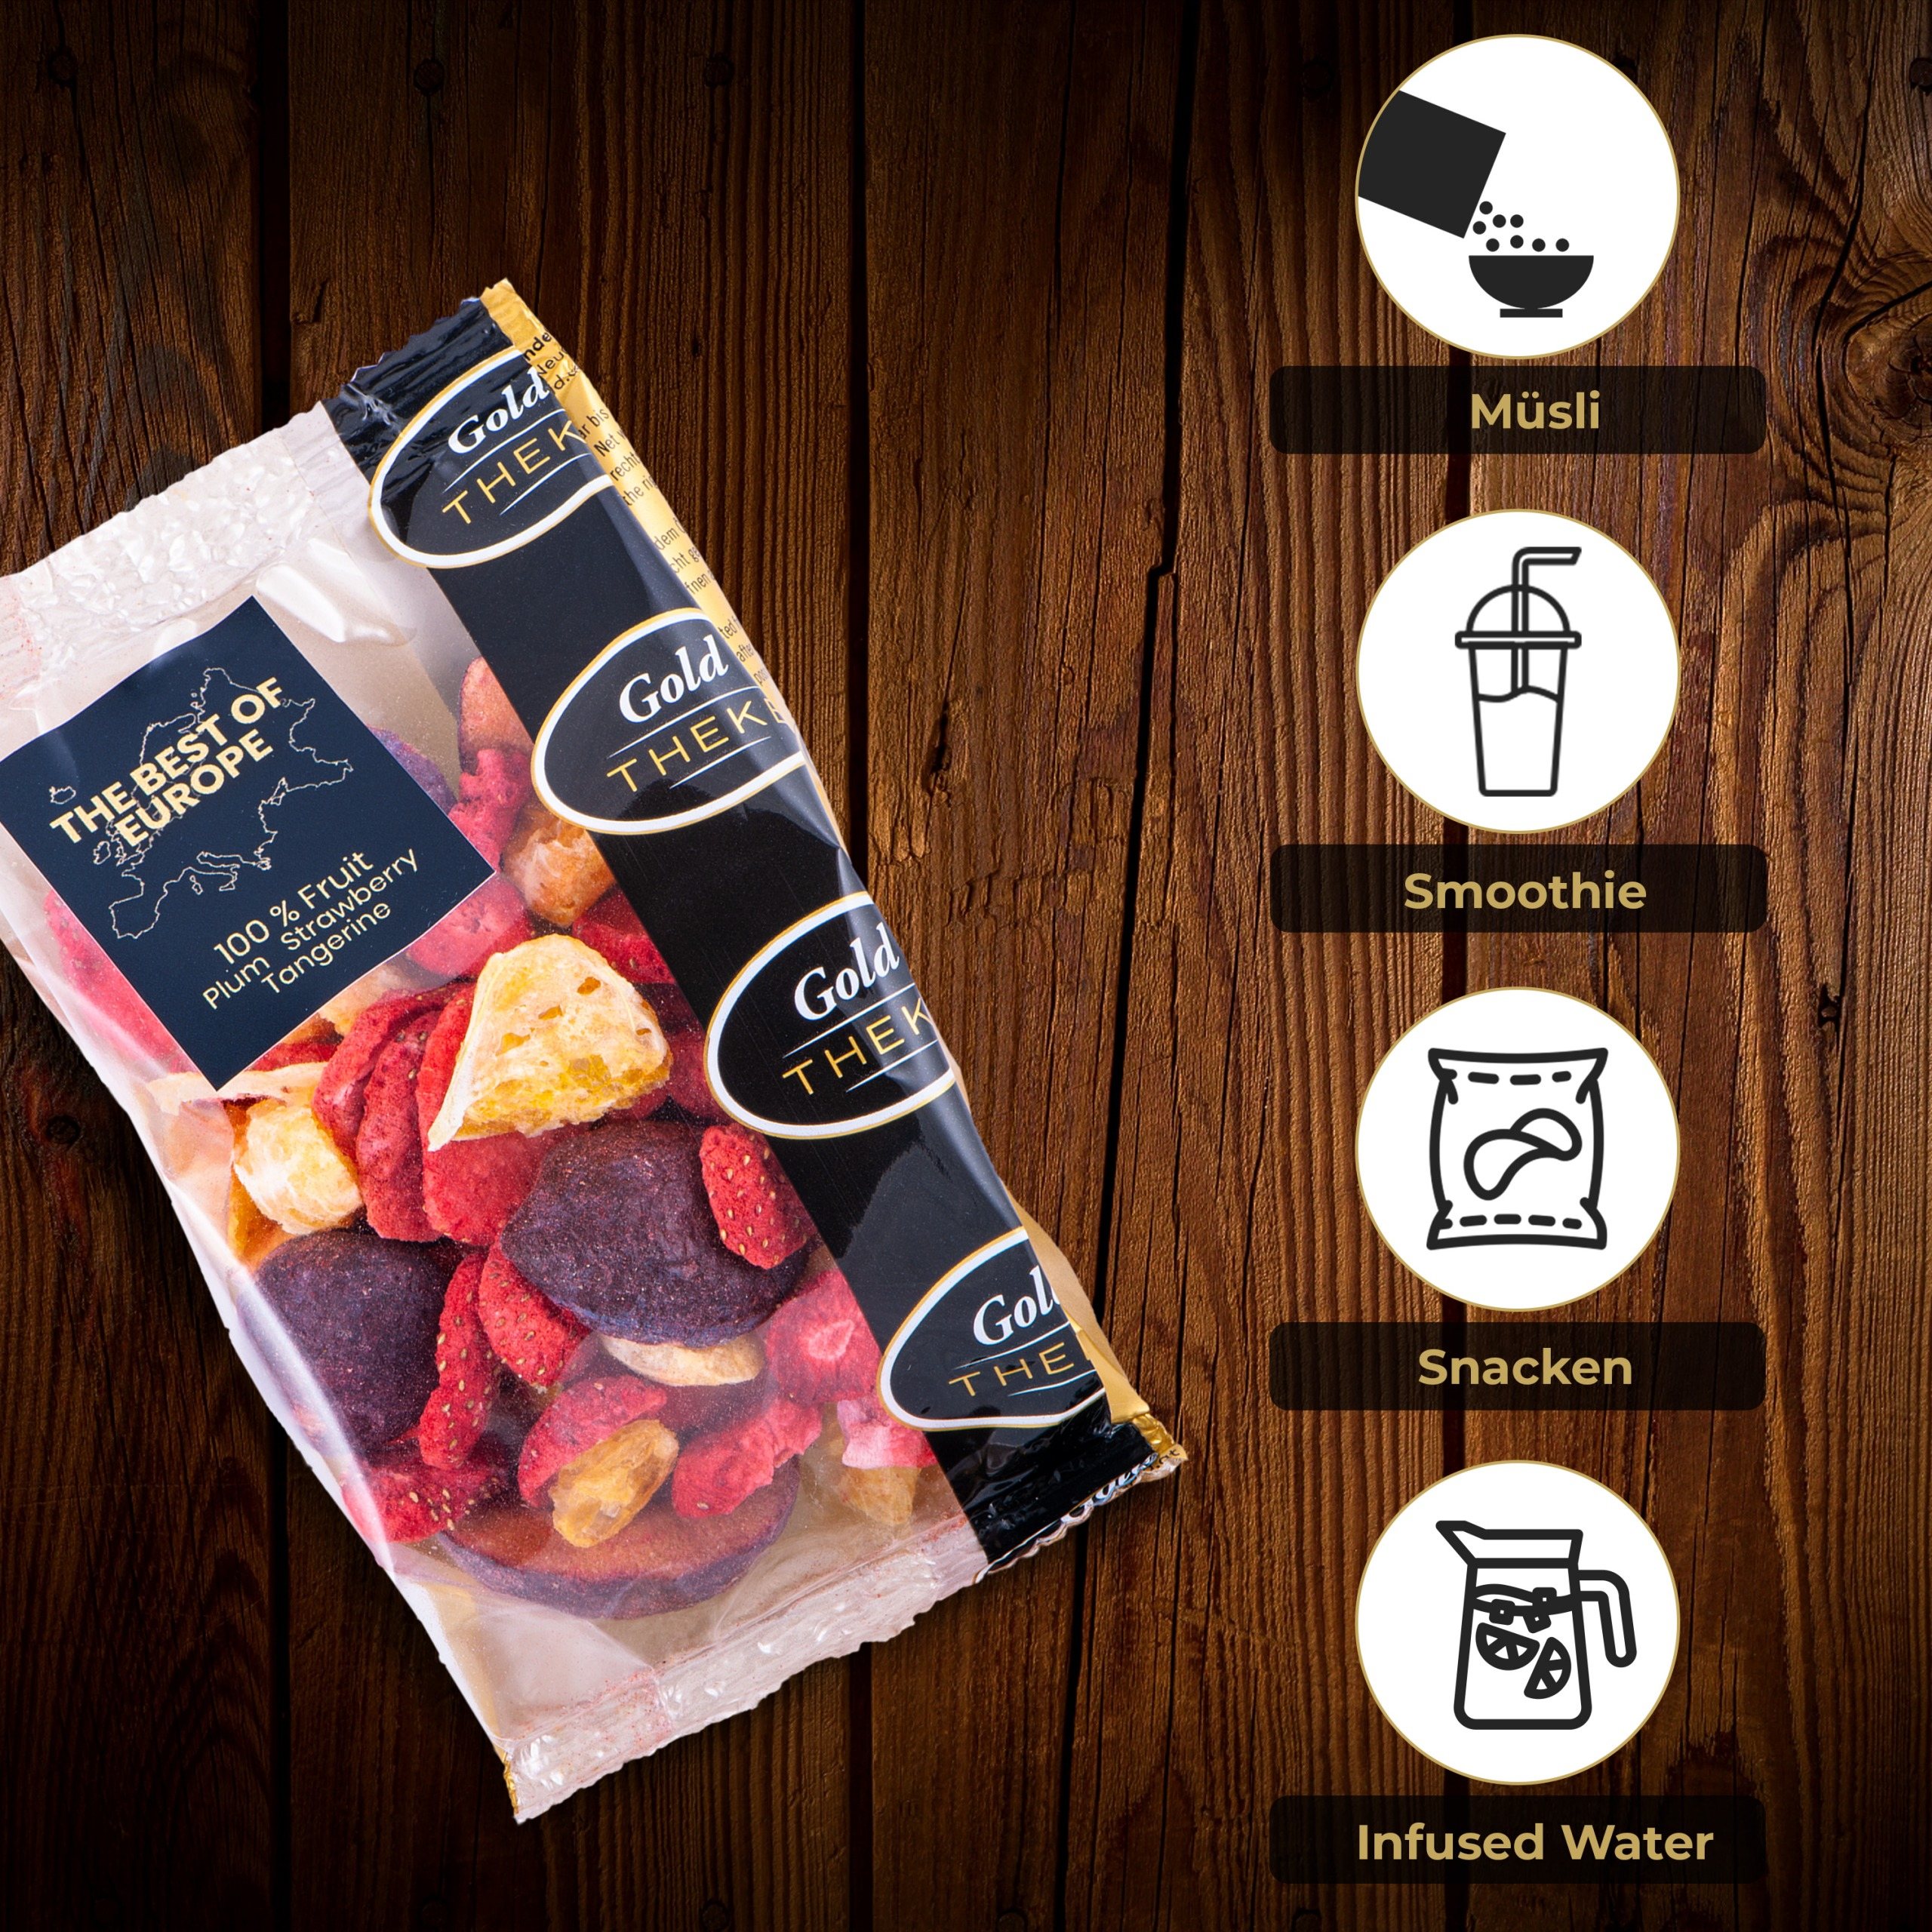 gefriegetrocknete Fruchtmischung GoldTHEKE - Best of Europe - gefriergetrocknete Erdbeeren, Mandarinen, Pflaumen - Info 3